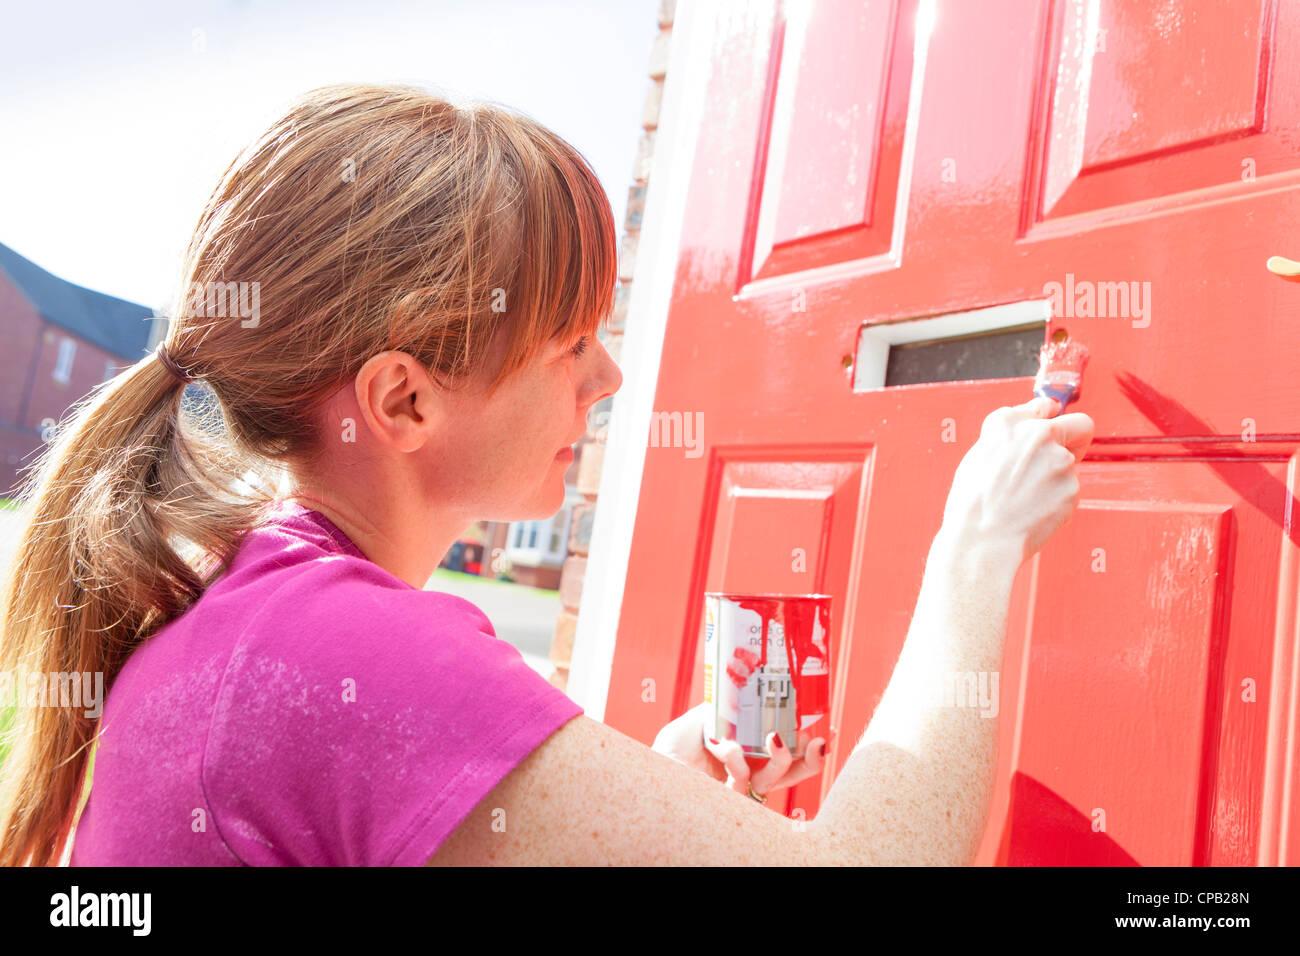 Woman in her thirties painting her front door red. Stock Photo